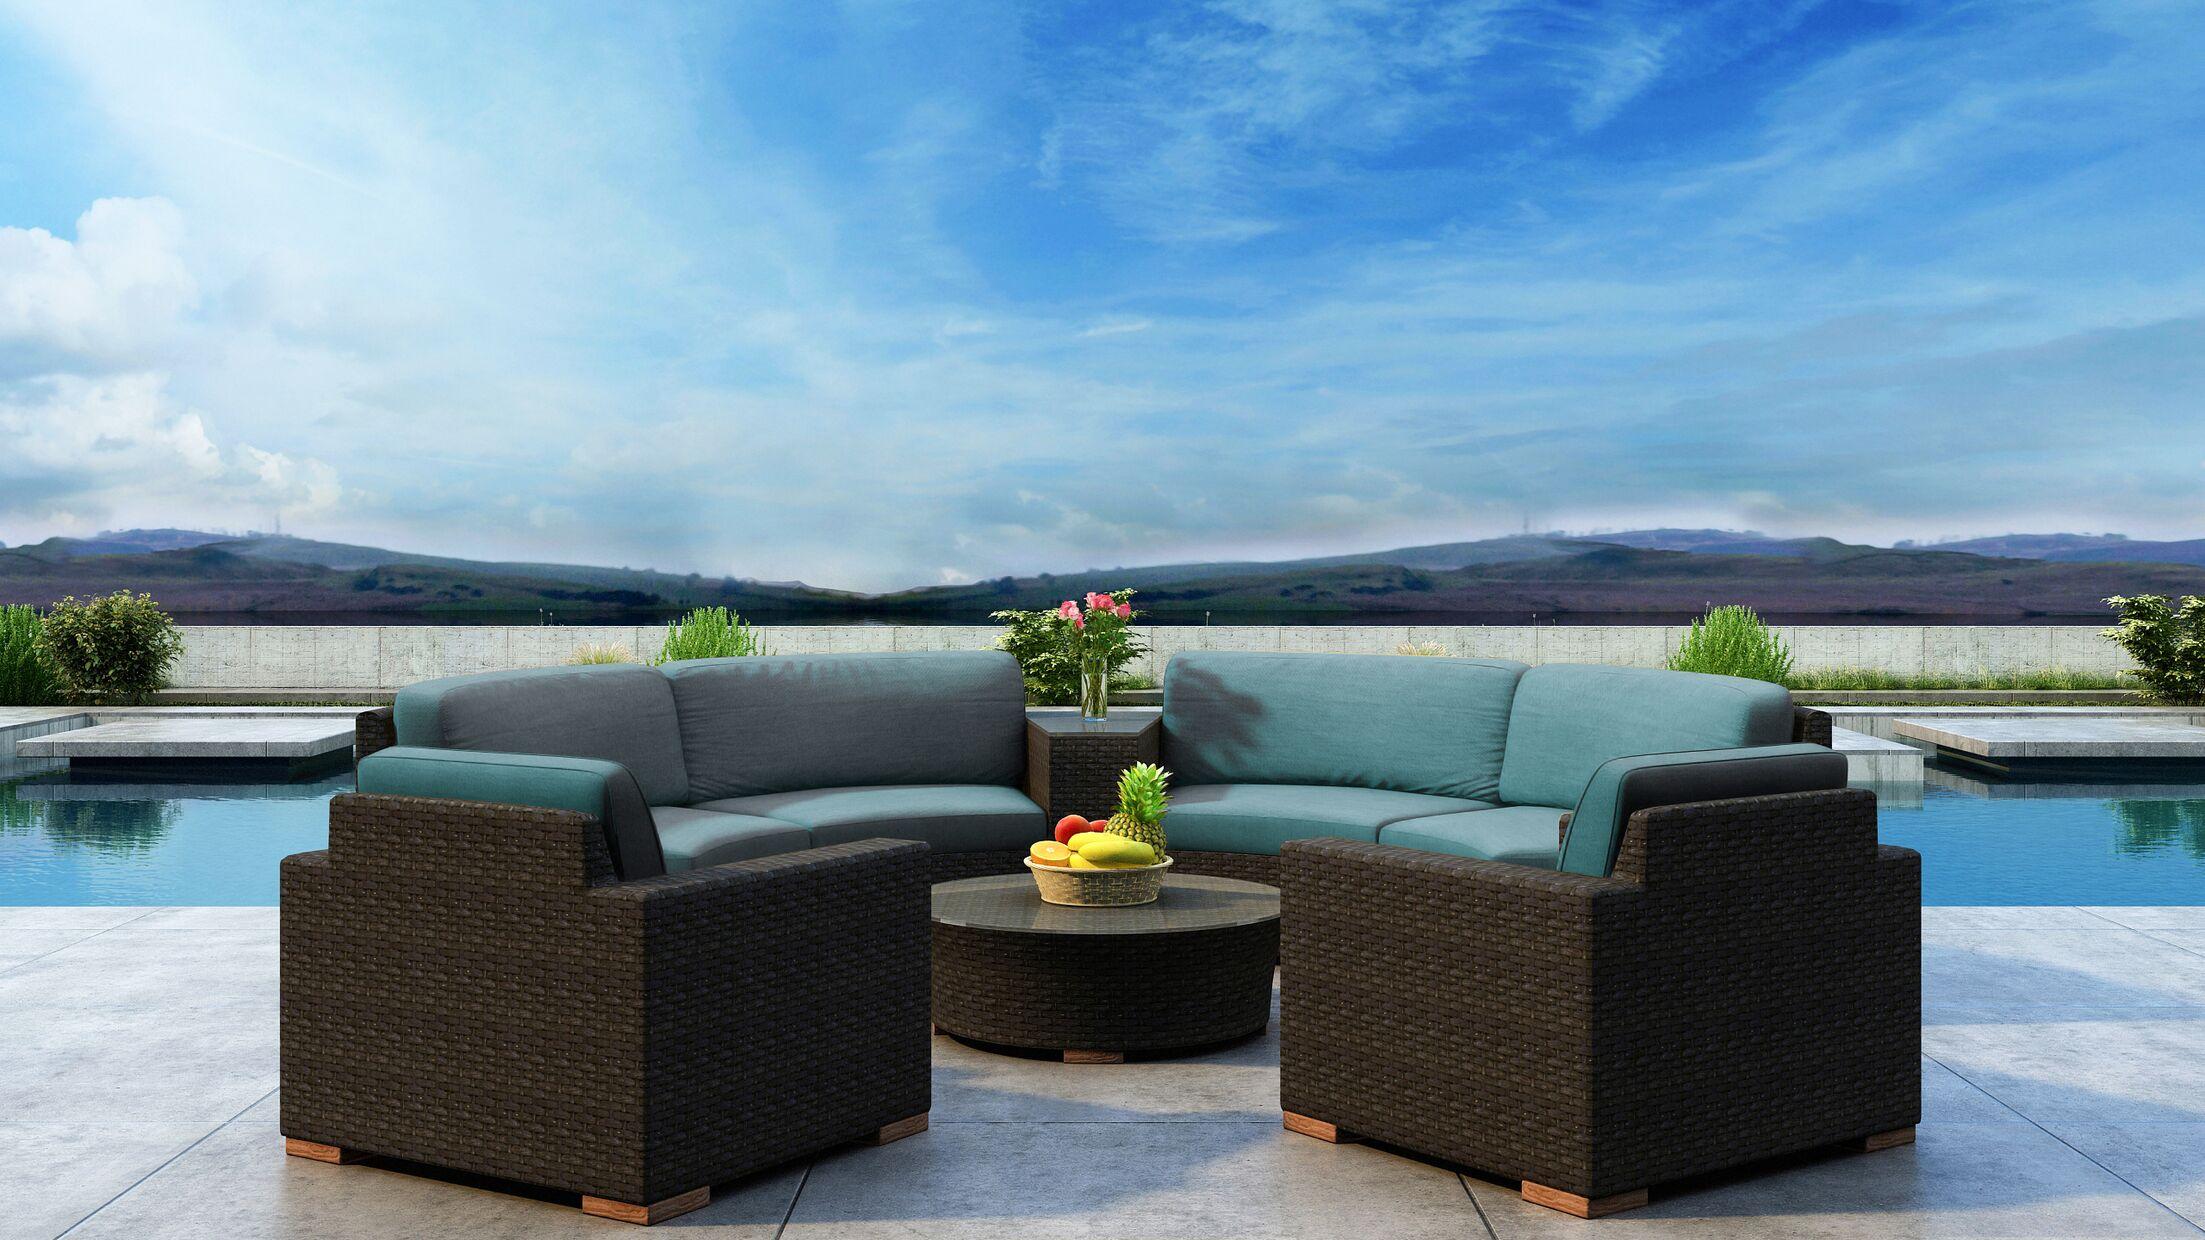 Glen Ellyn 6 Piece Sectional Set with Sunbrella Cushion Cushion Color: Cast Lagoon